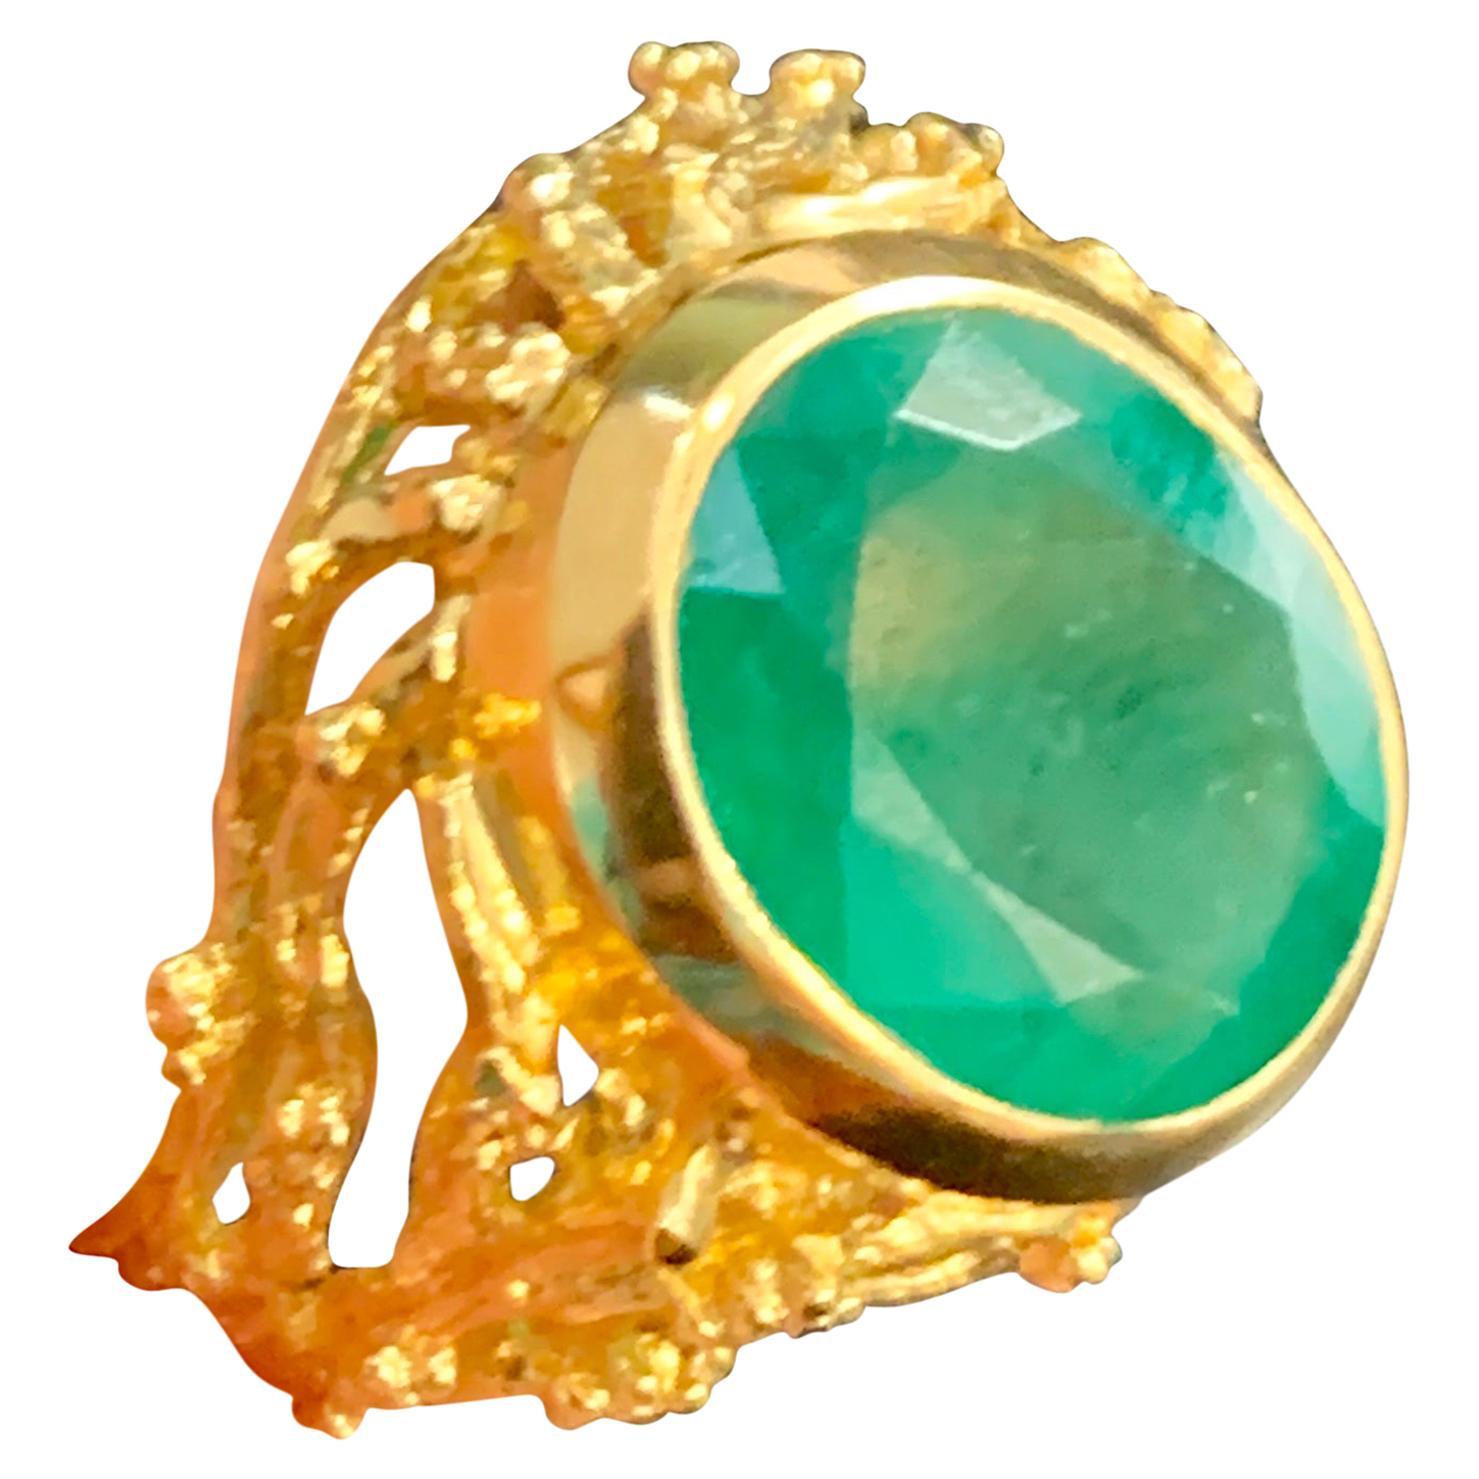 7 Carat Oval Shape Natural Emerald Ring 18 Karat Yellow Gold